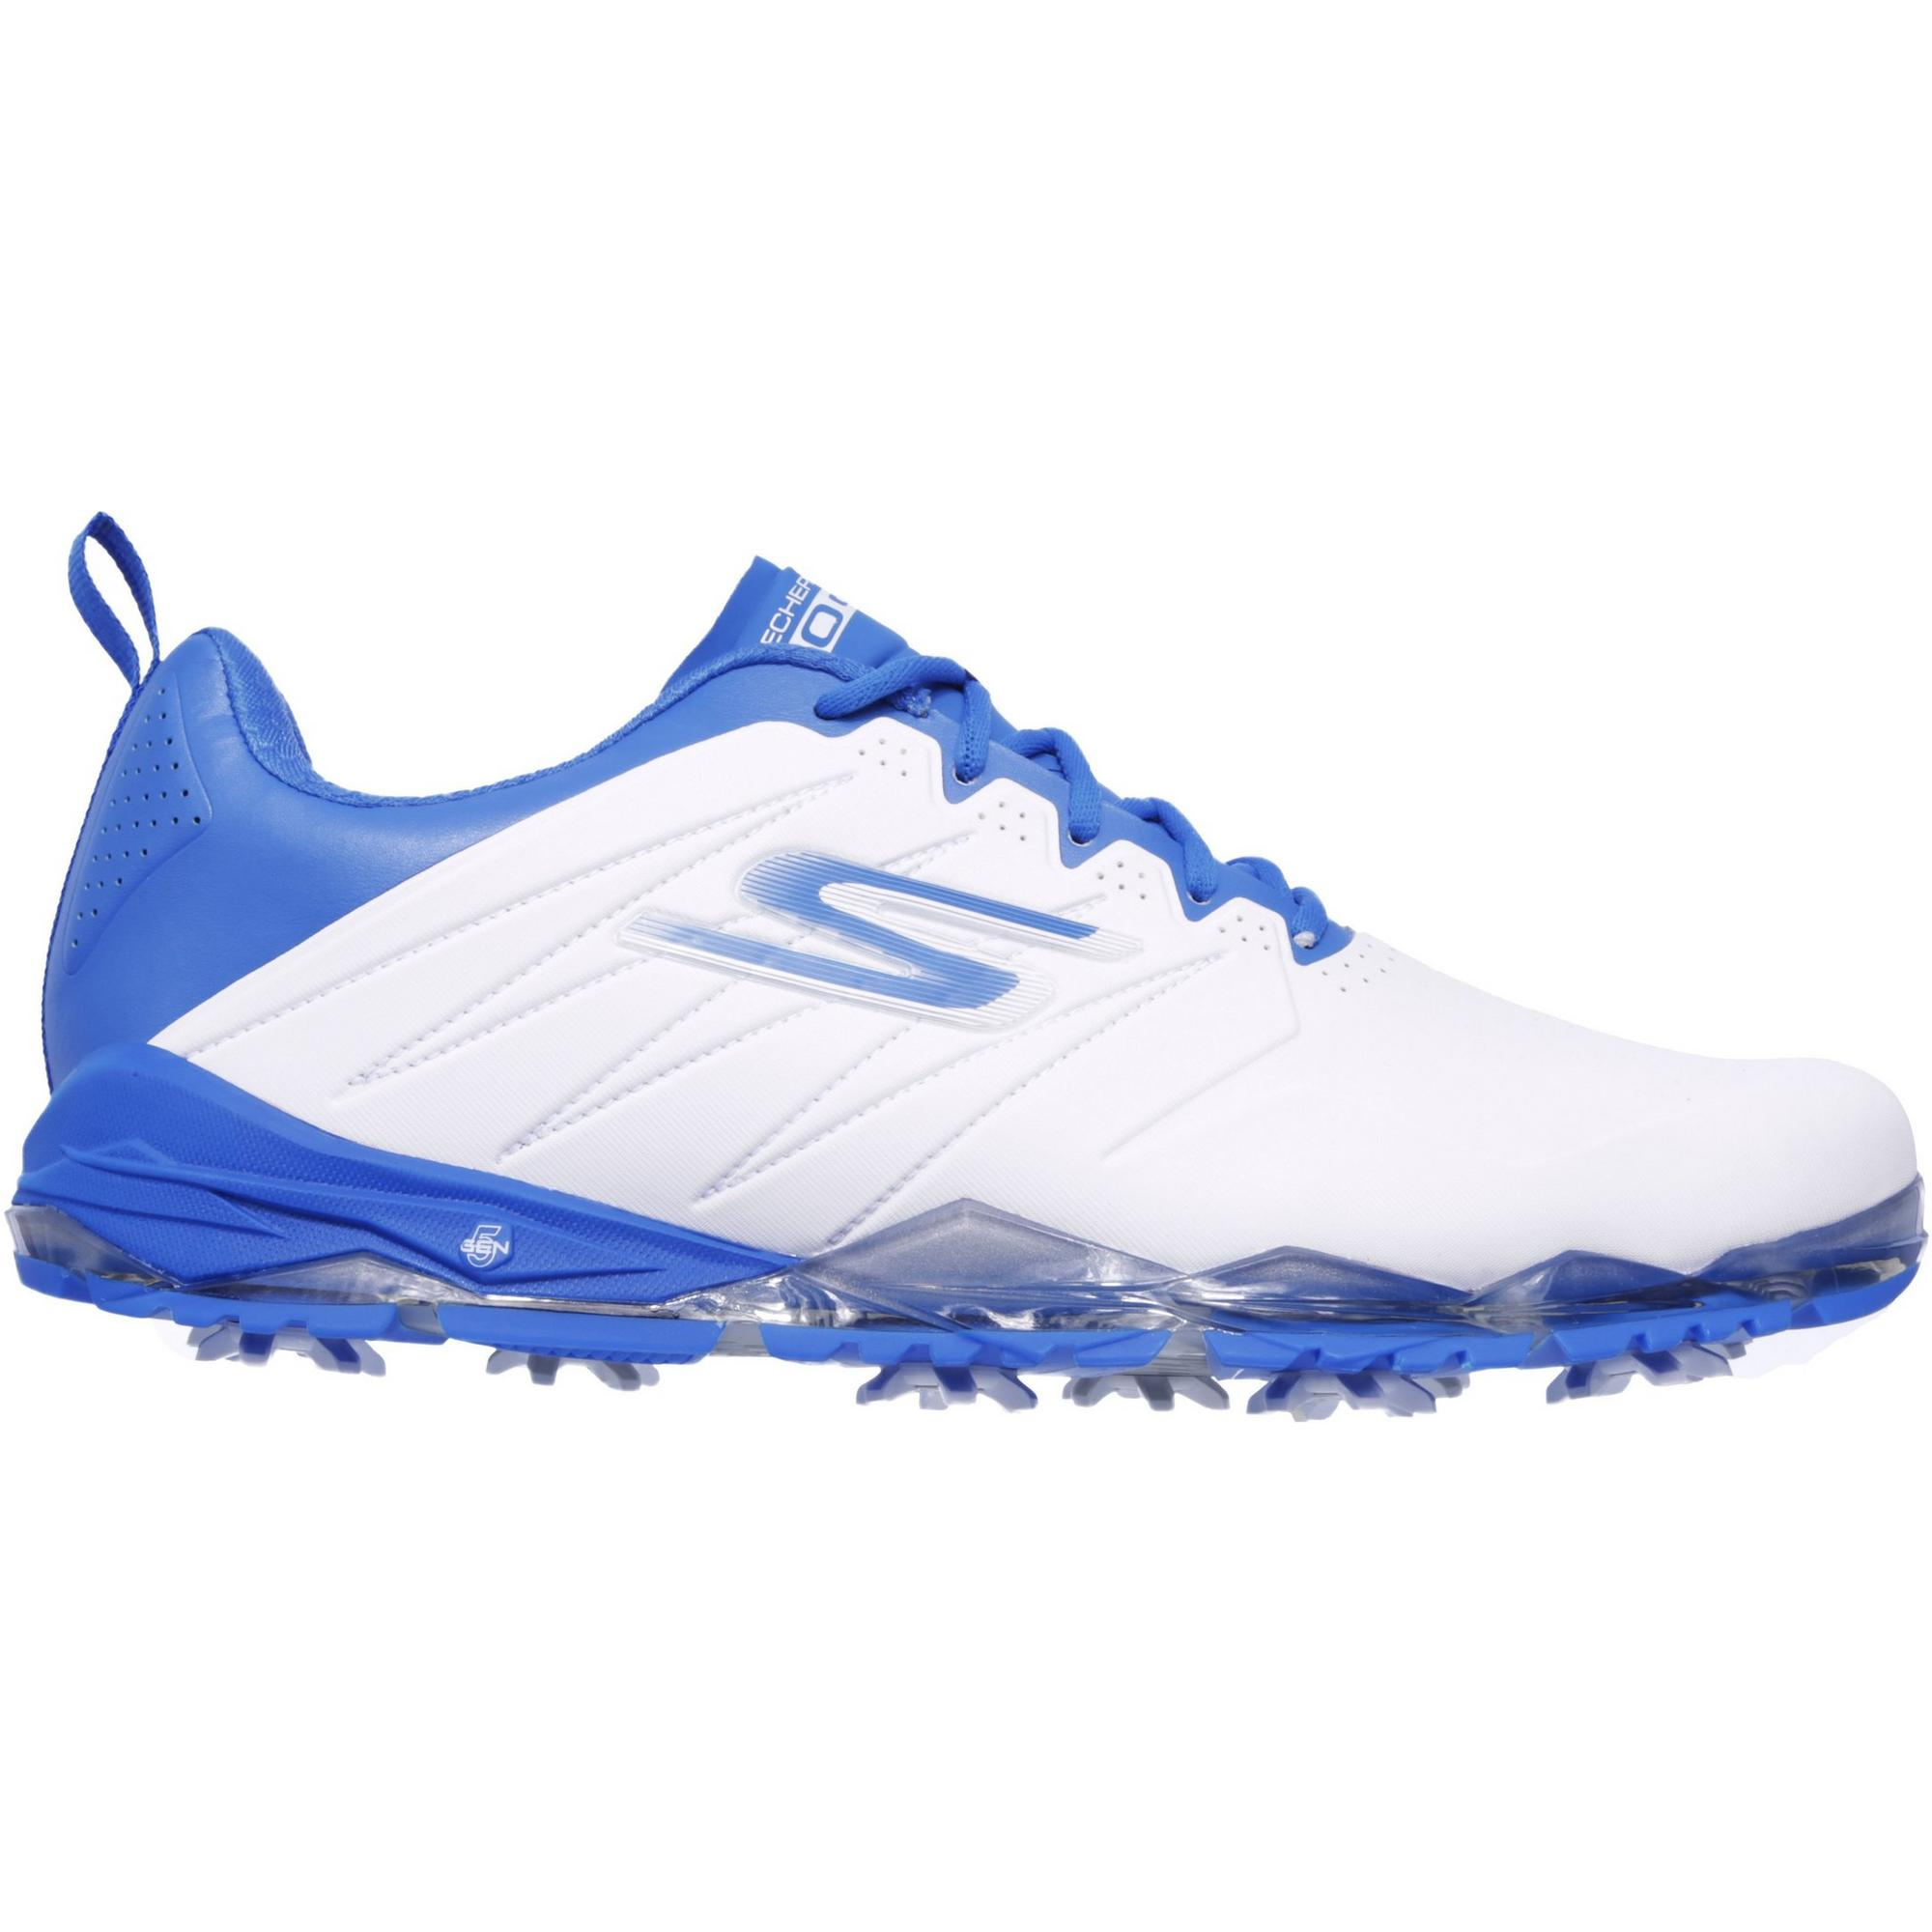 Men's Go Golf Focus 2 Collegiate Spiked Golf Shoe - WHT/BLU